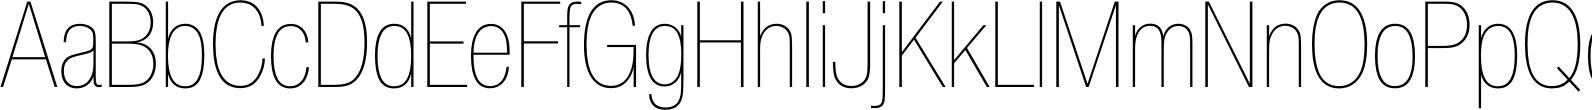 Nimbus Sans Novus